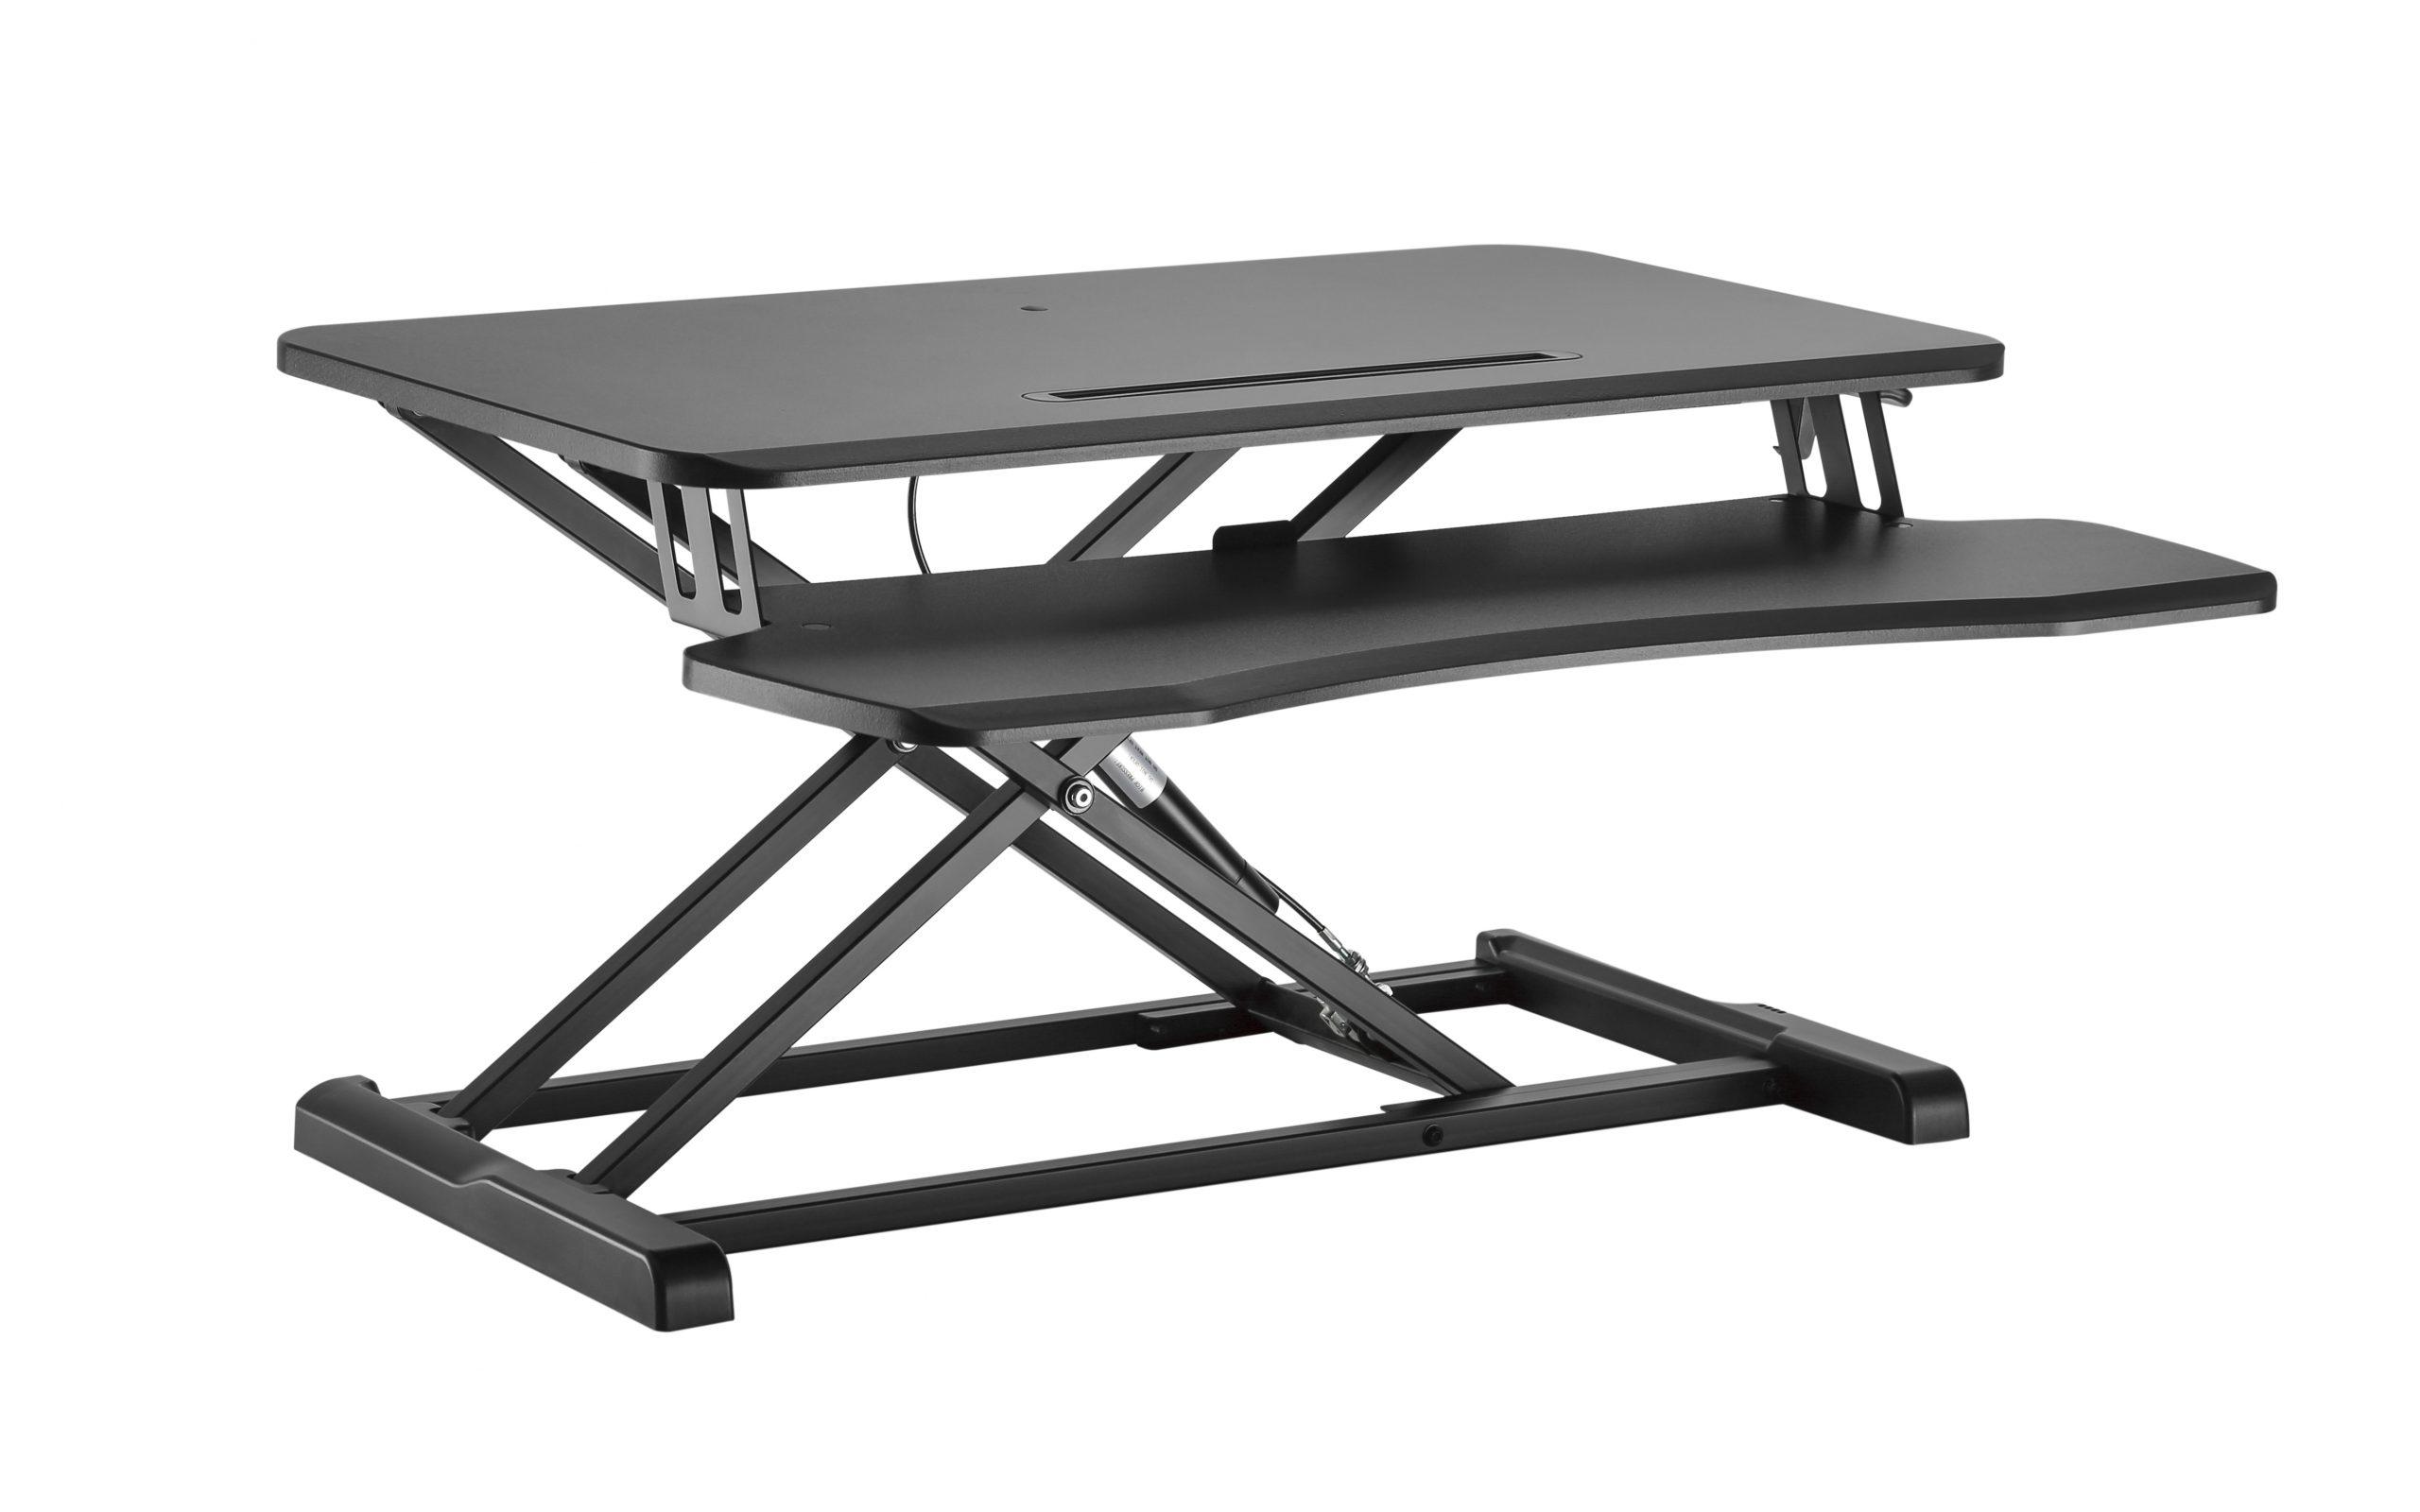 GSS061A Sit-stand desk converter standing workstation gas spring height adjustable black